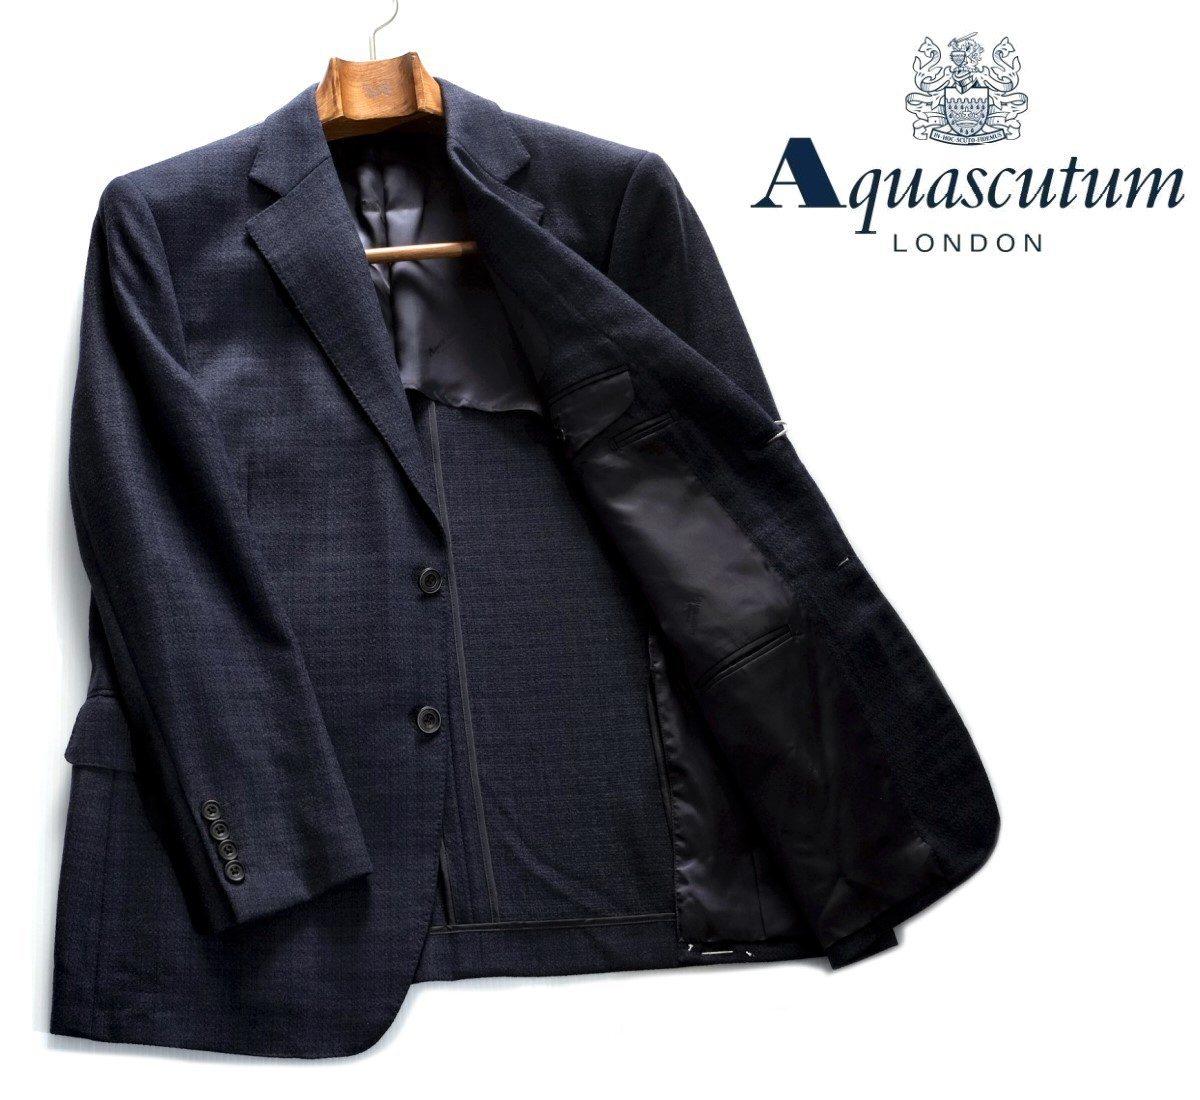 Aquascutum【アクアスキュータム】定価154,000円(税込)◆60%OFF◆日本製織柄ジャケット濃紺 ネイビー背抜き仕立て